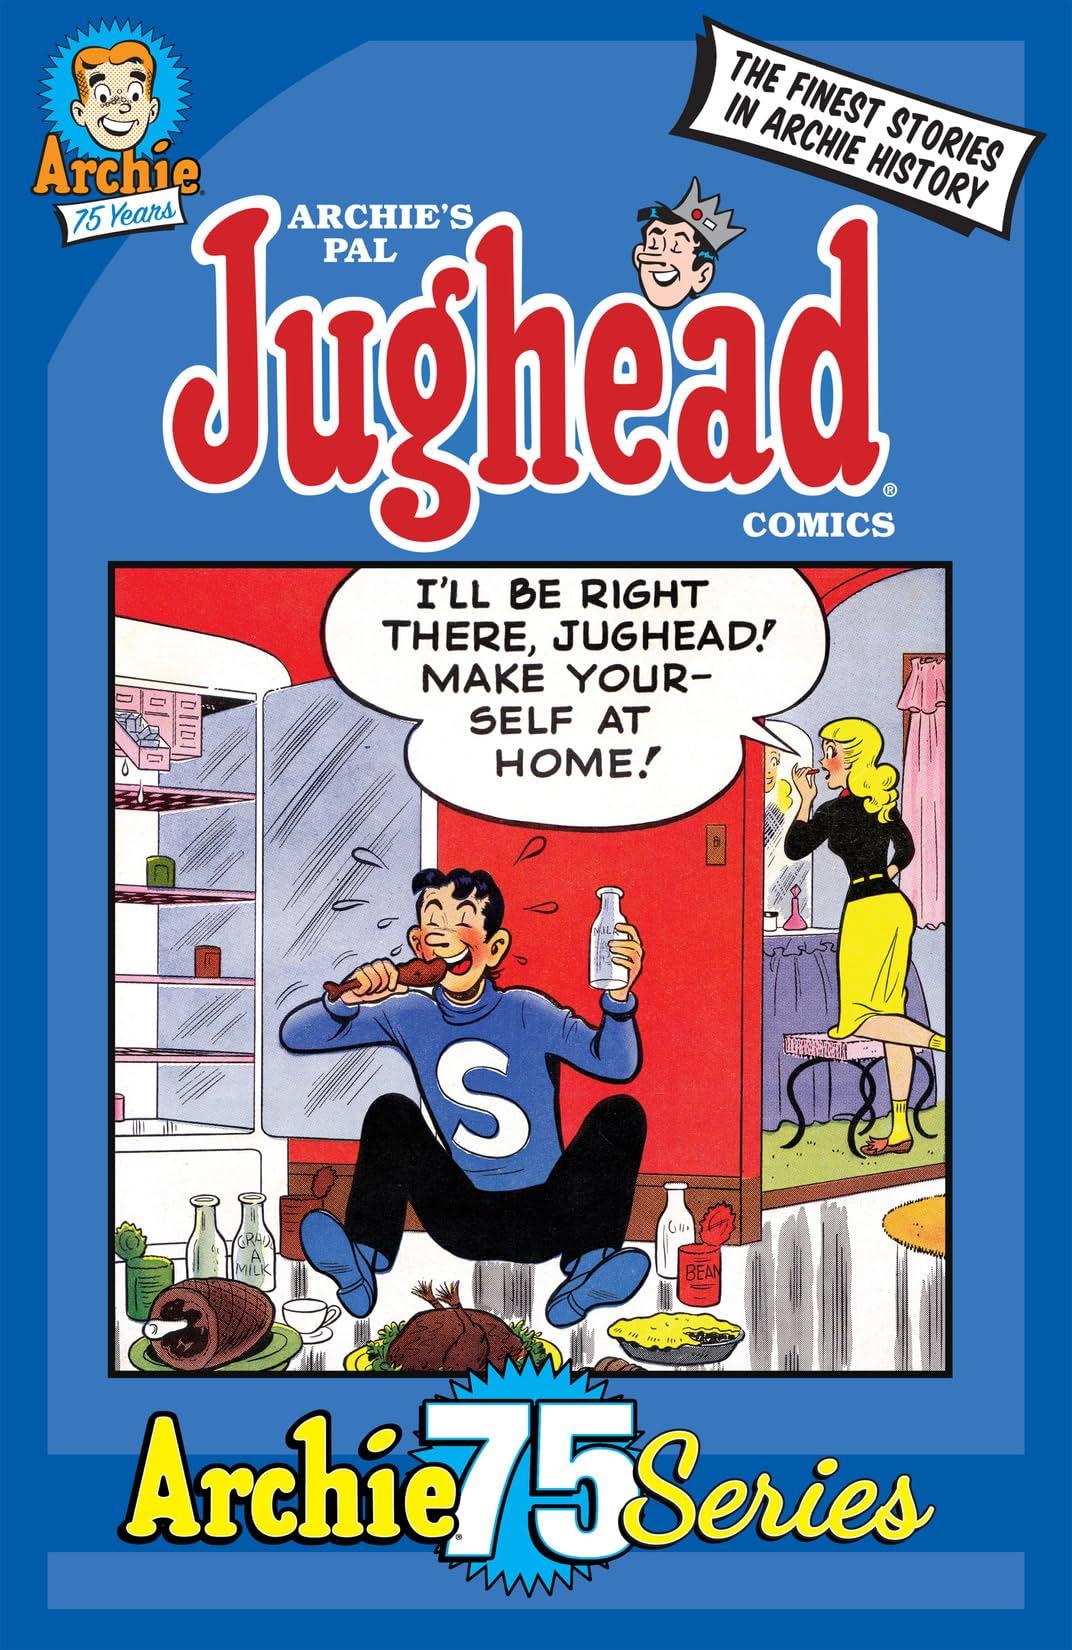 Archie 75 Series #10: Jughead